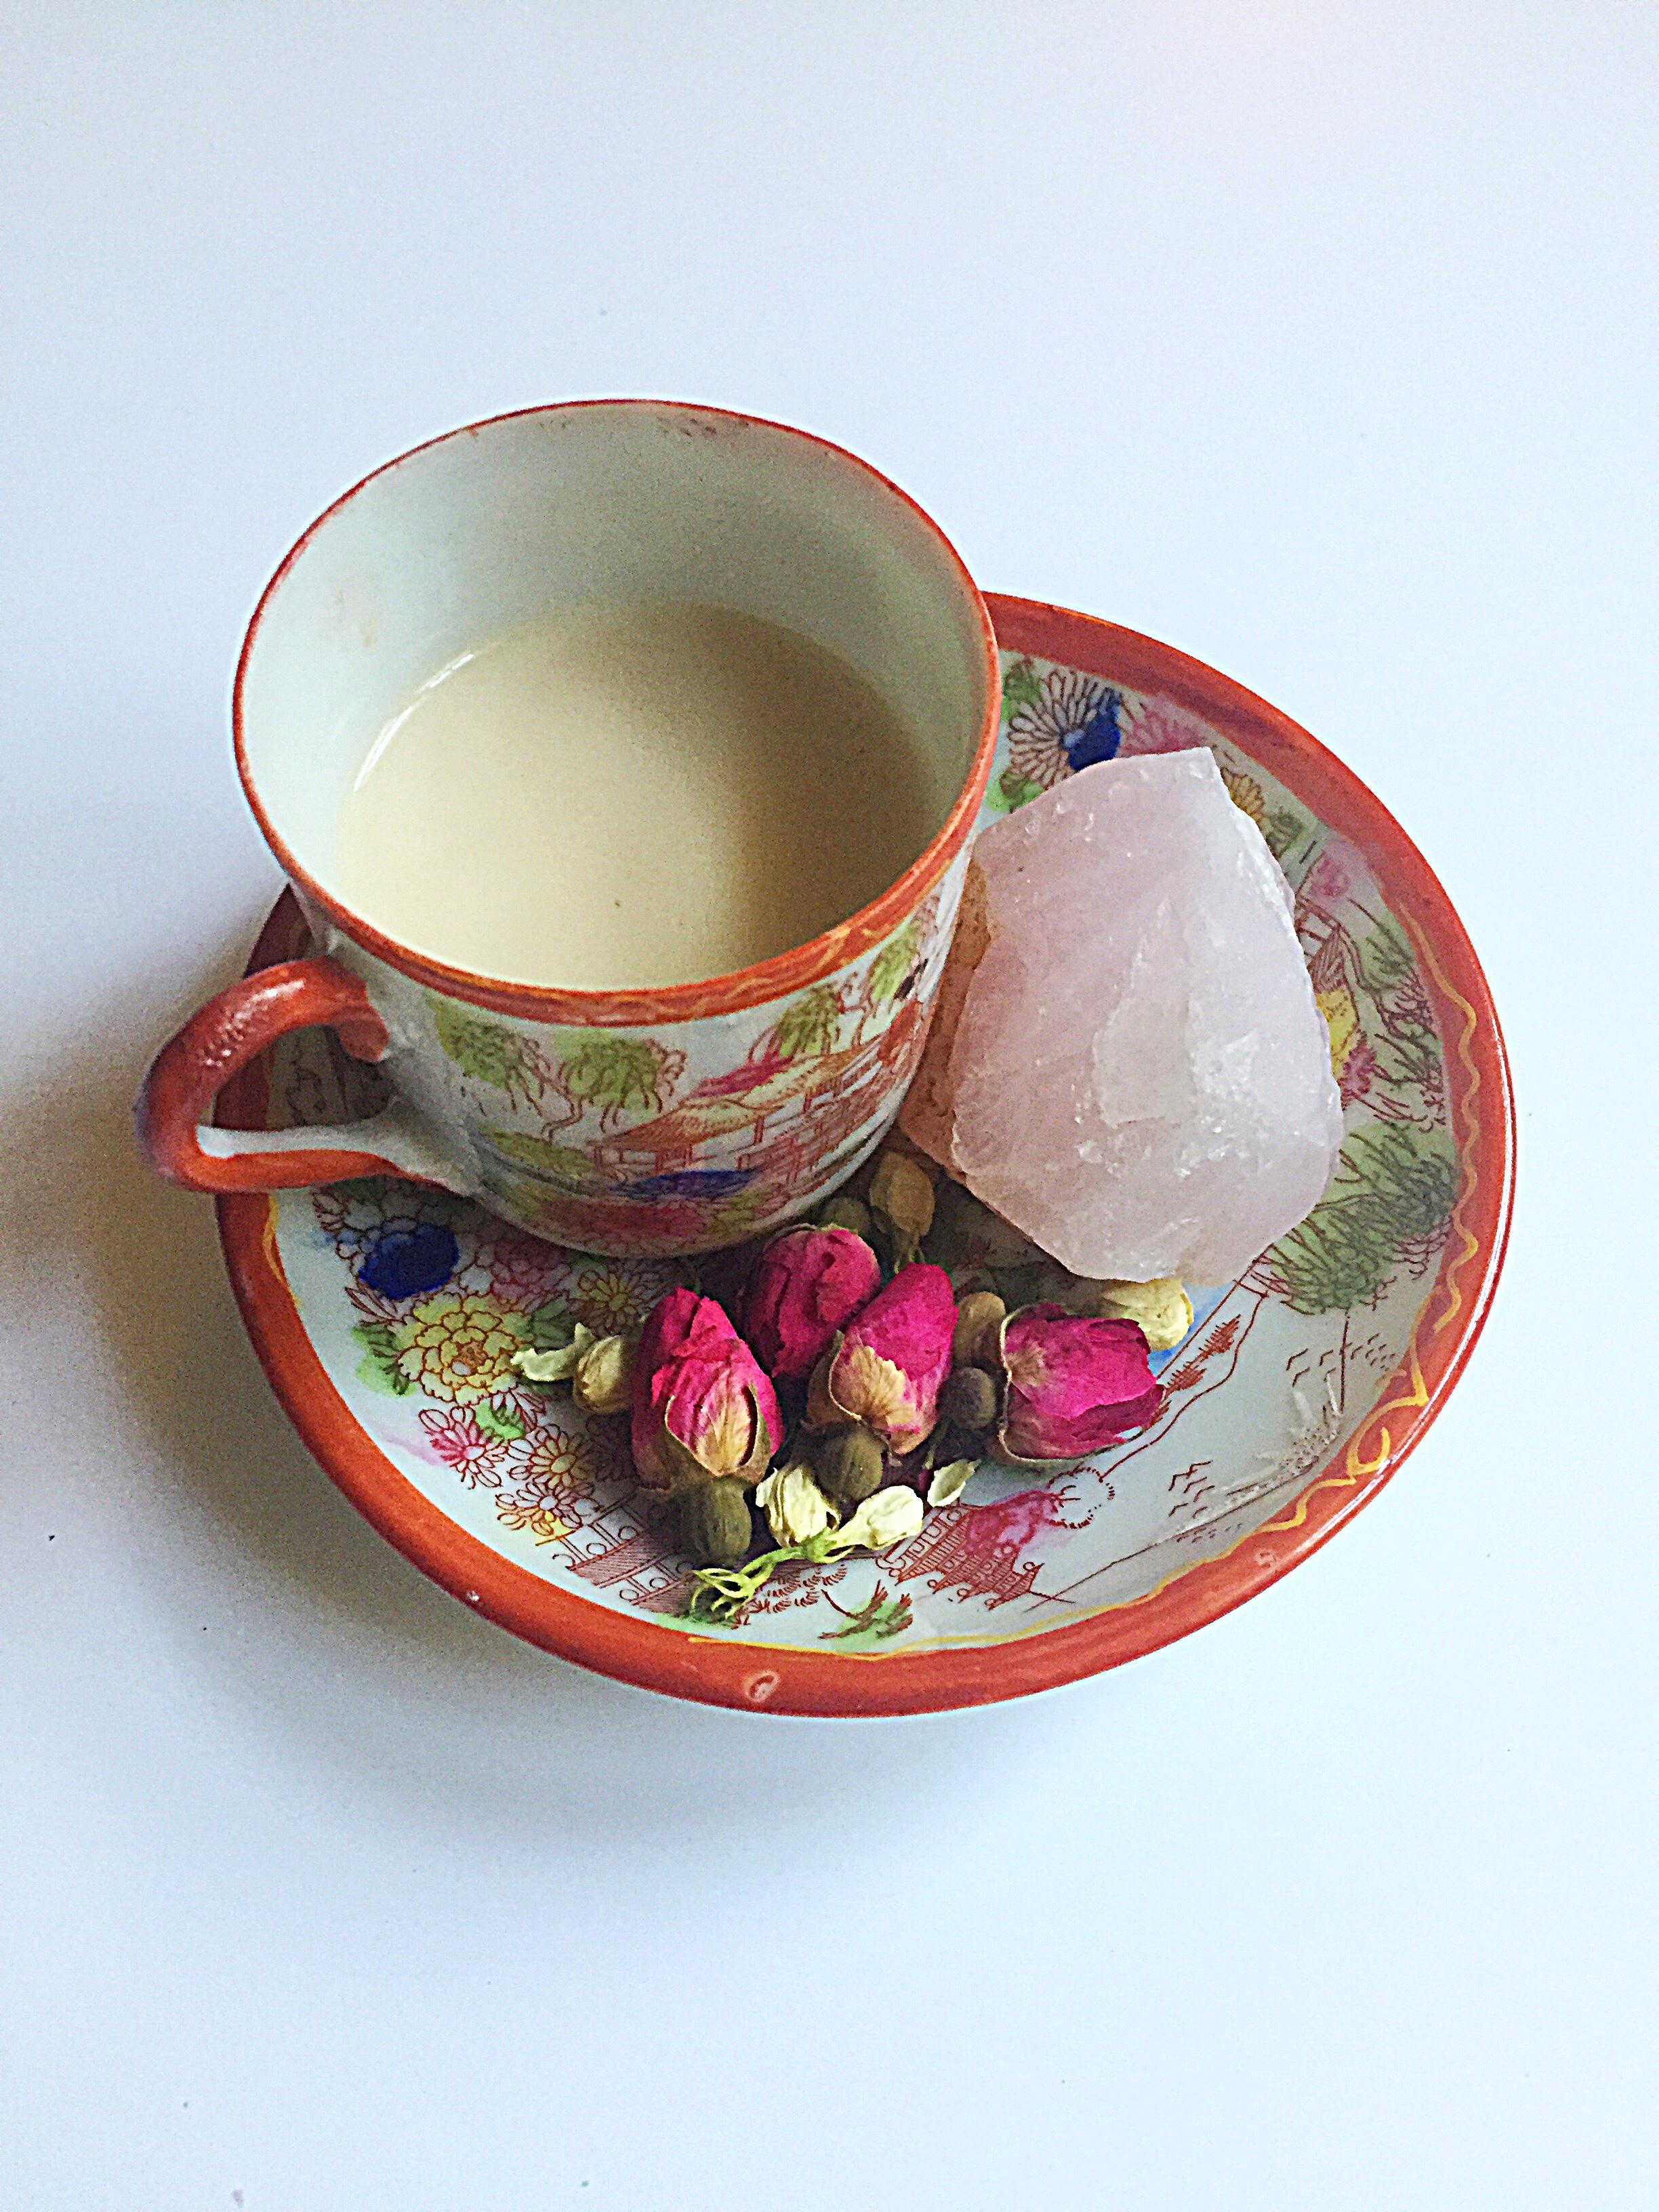 Honey & Rose Milk Ritual Tea: A Recipe For Self-Love & Empowerment